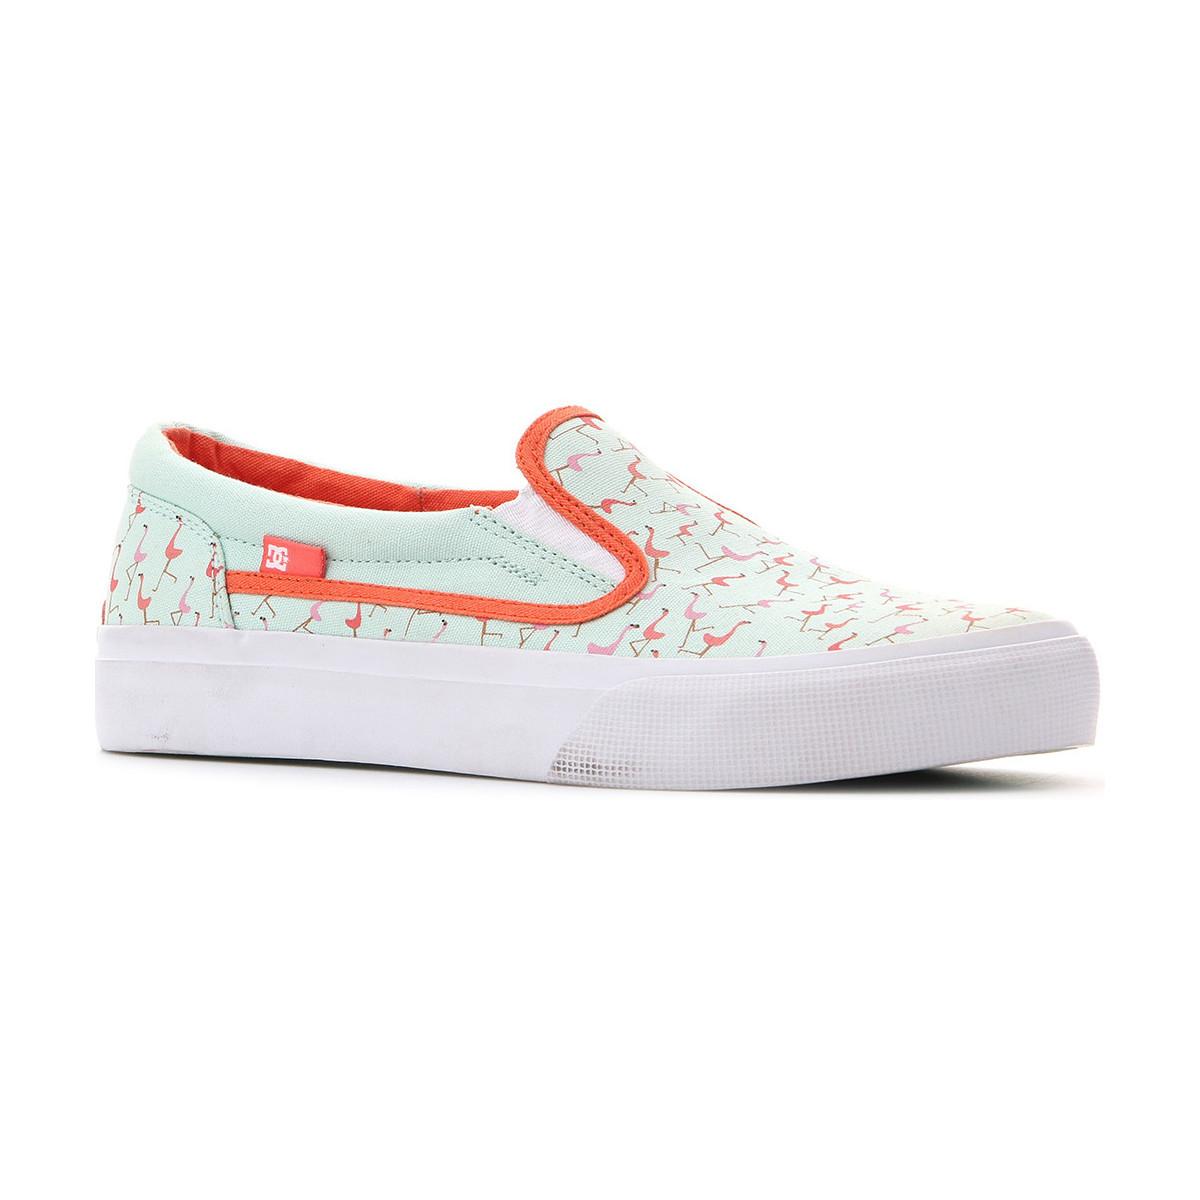 DC Shoes DC Trase ADBS300135 MIB Wielokolorowy - Kostenloser Versand bei Spartoode ! - Schuhe Slip on Damen 47,29 €